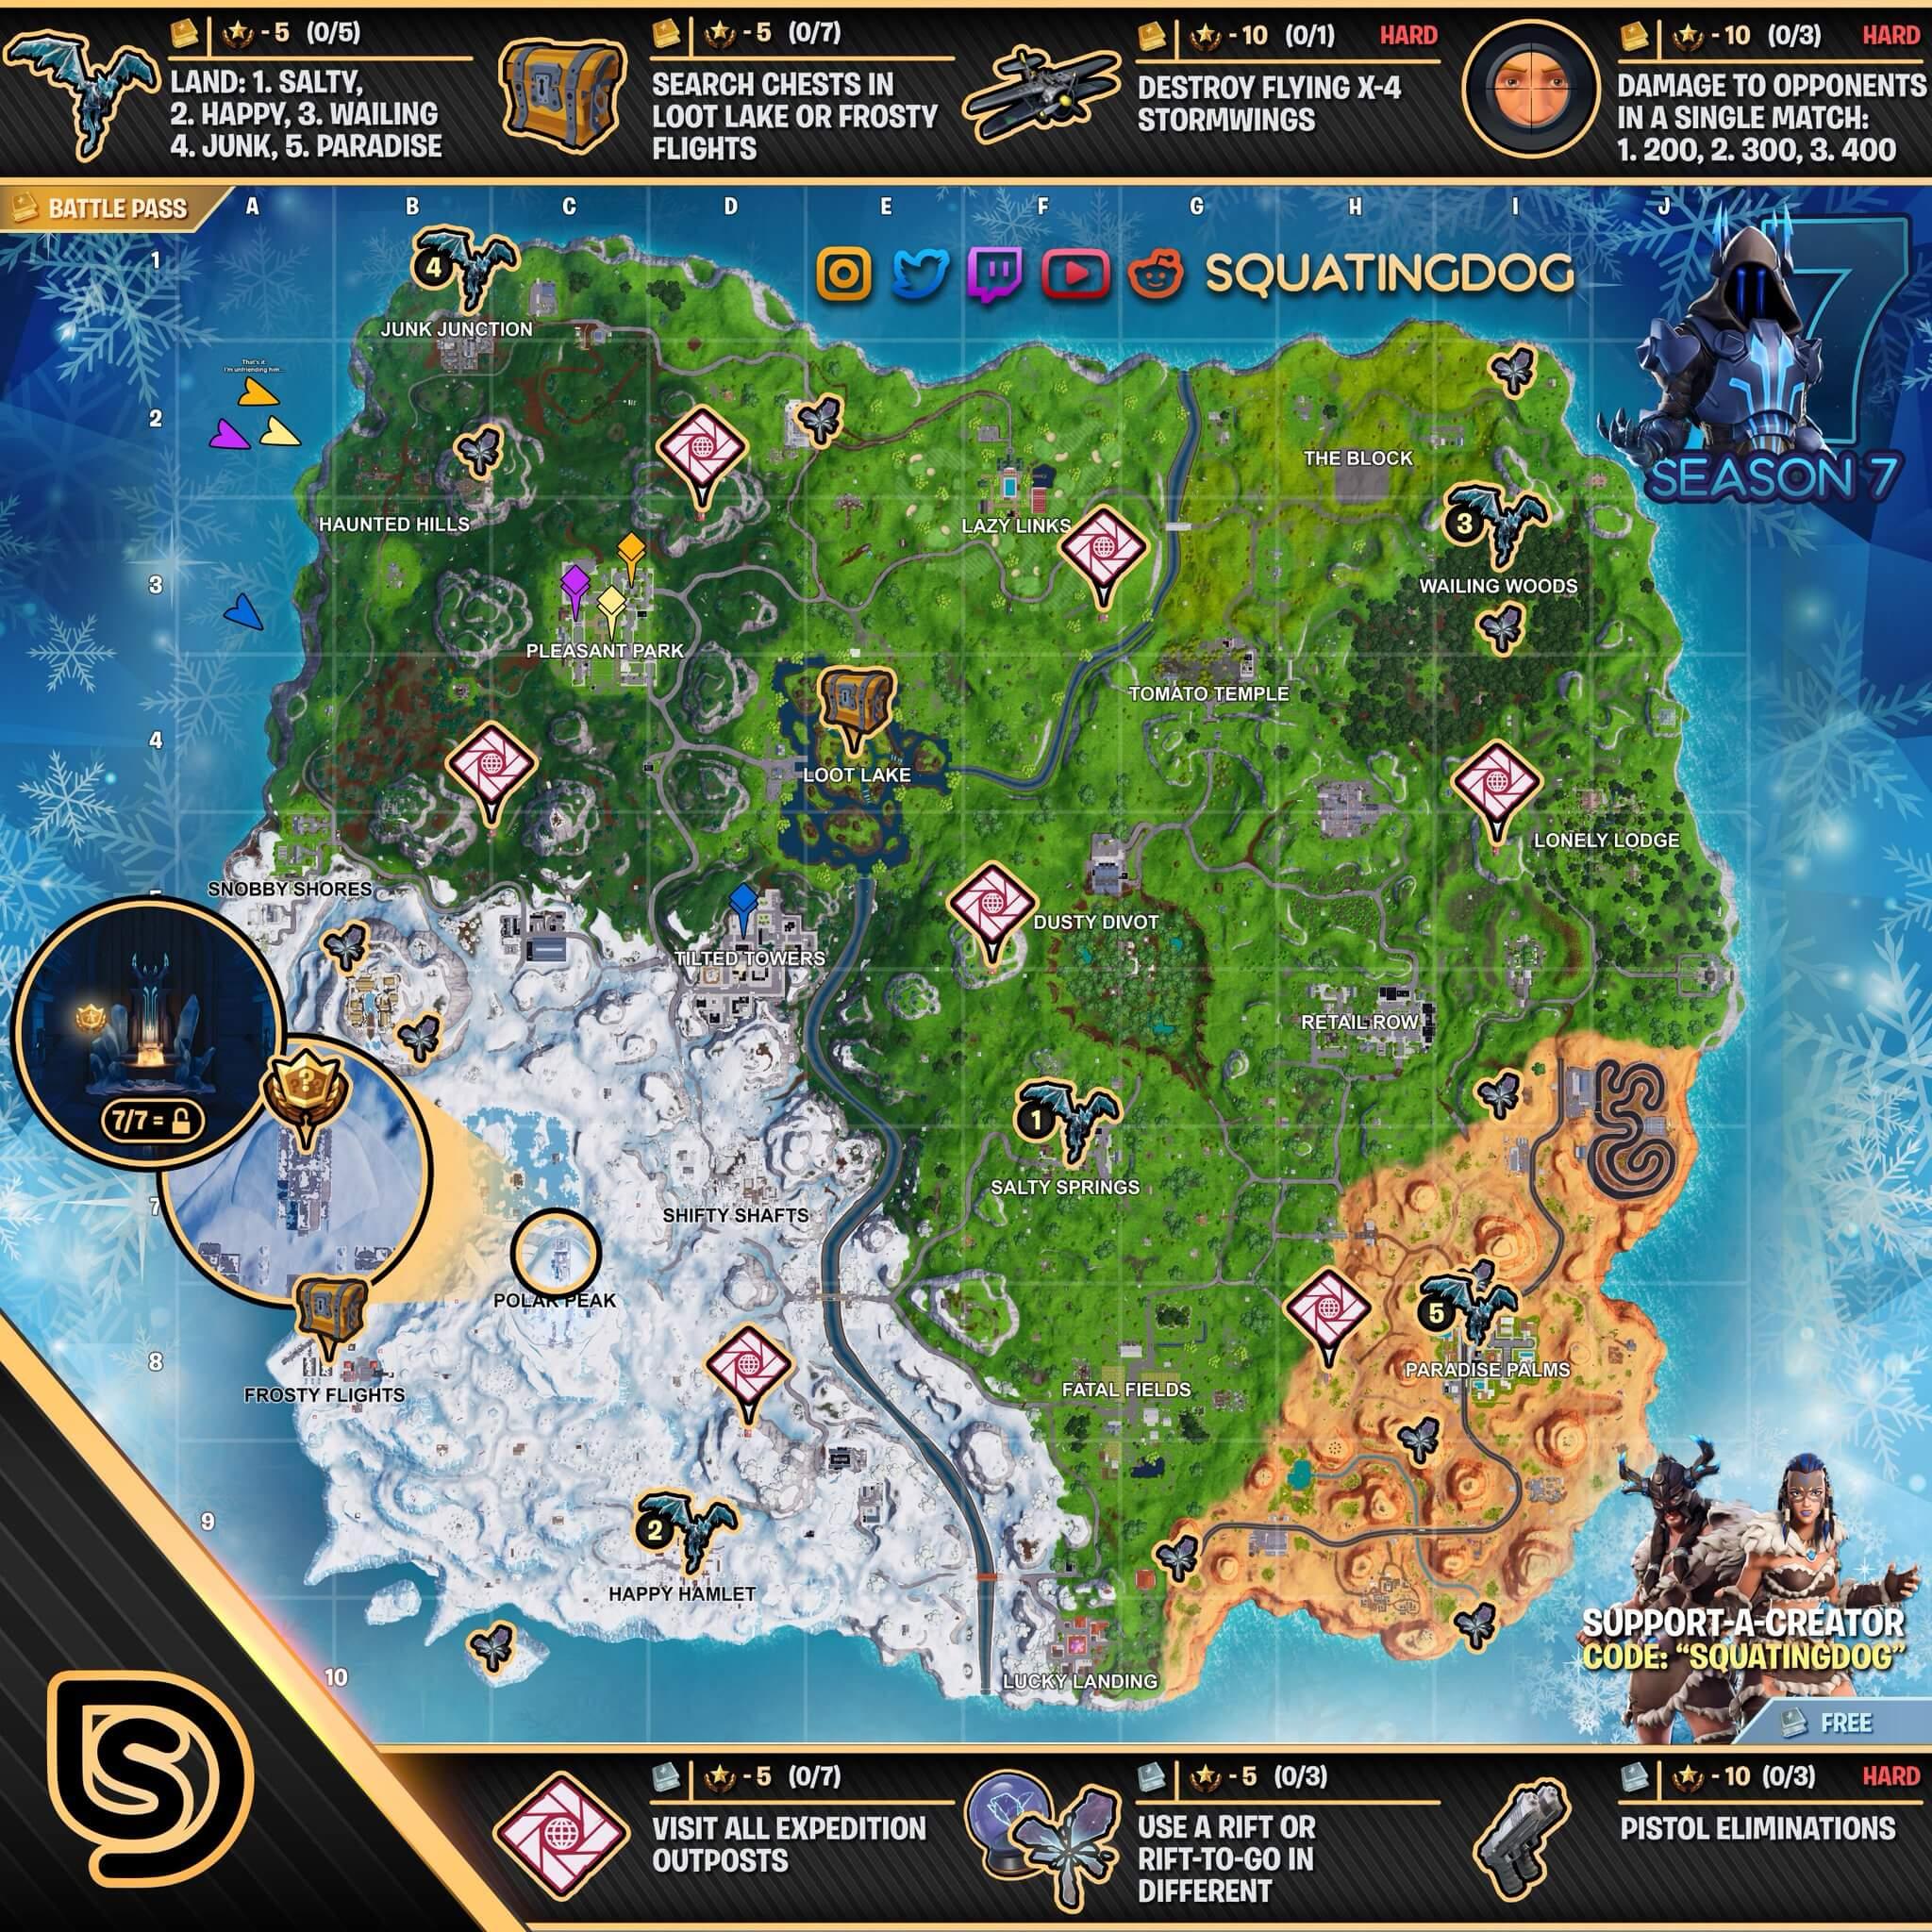 Fortnite Mapa semana 7 temporada 7